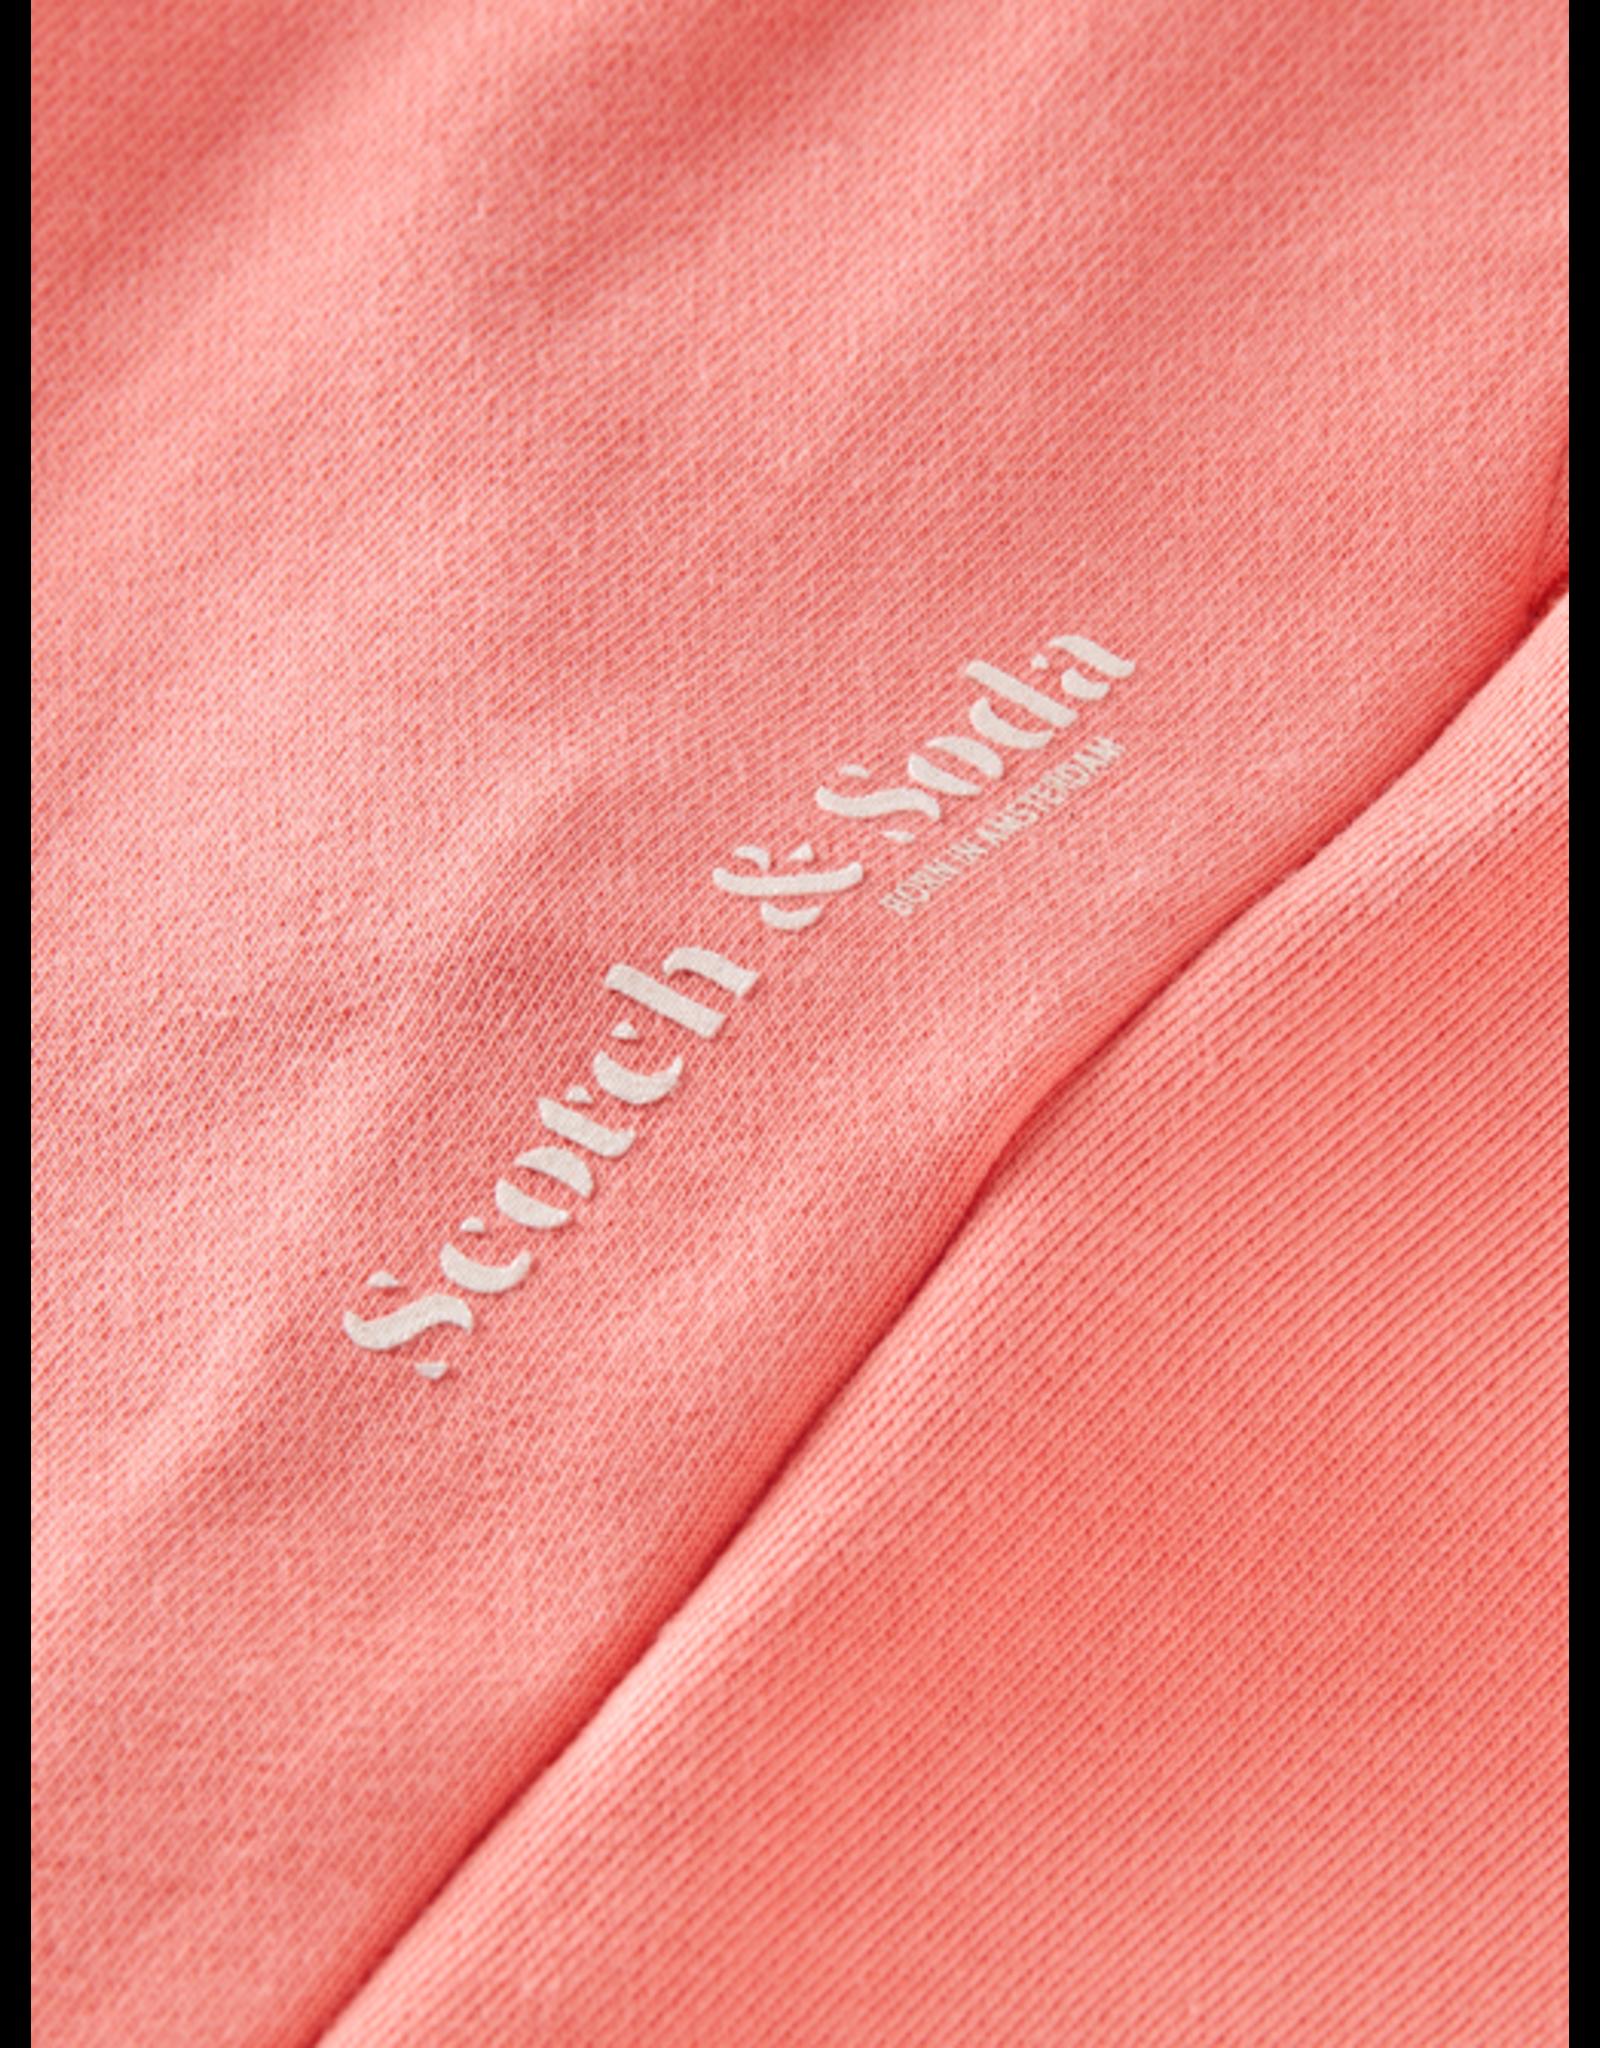 Scotch&Soda Scotch&Soda FW21 162975 Sweatpants peach